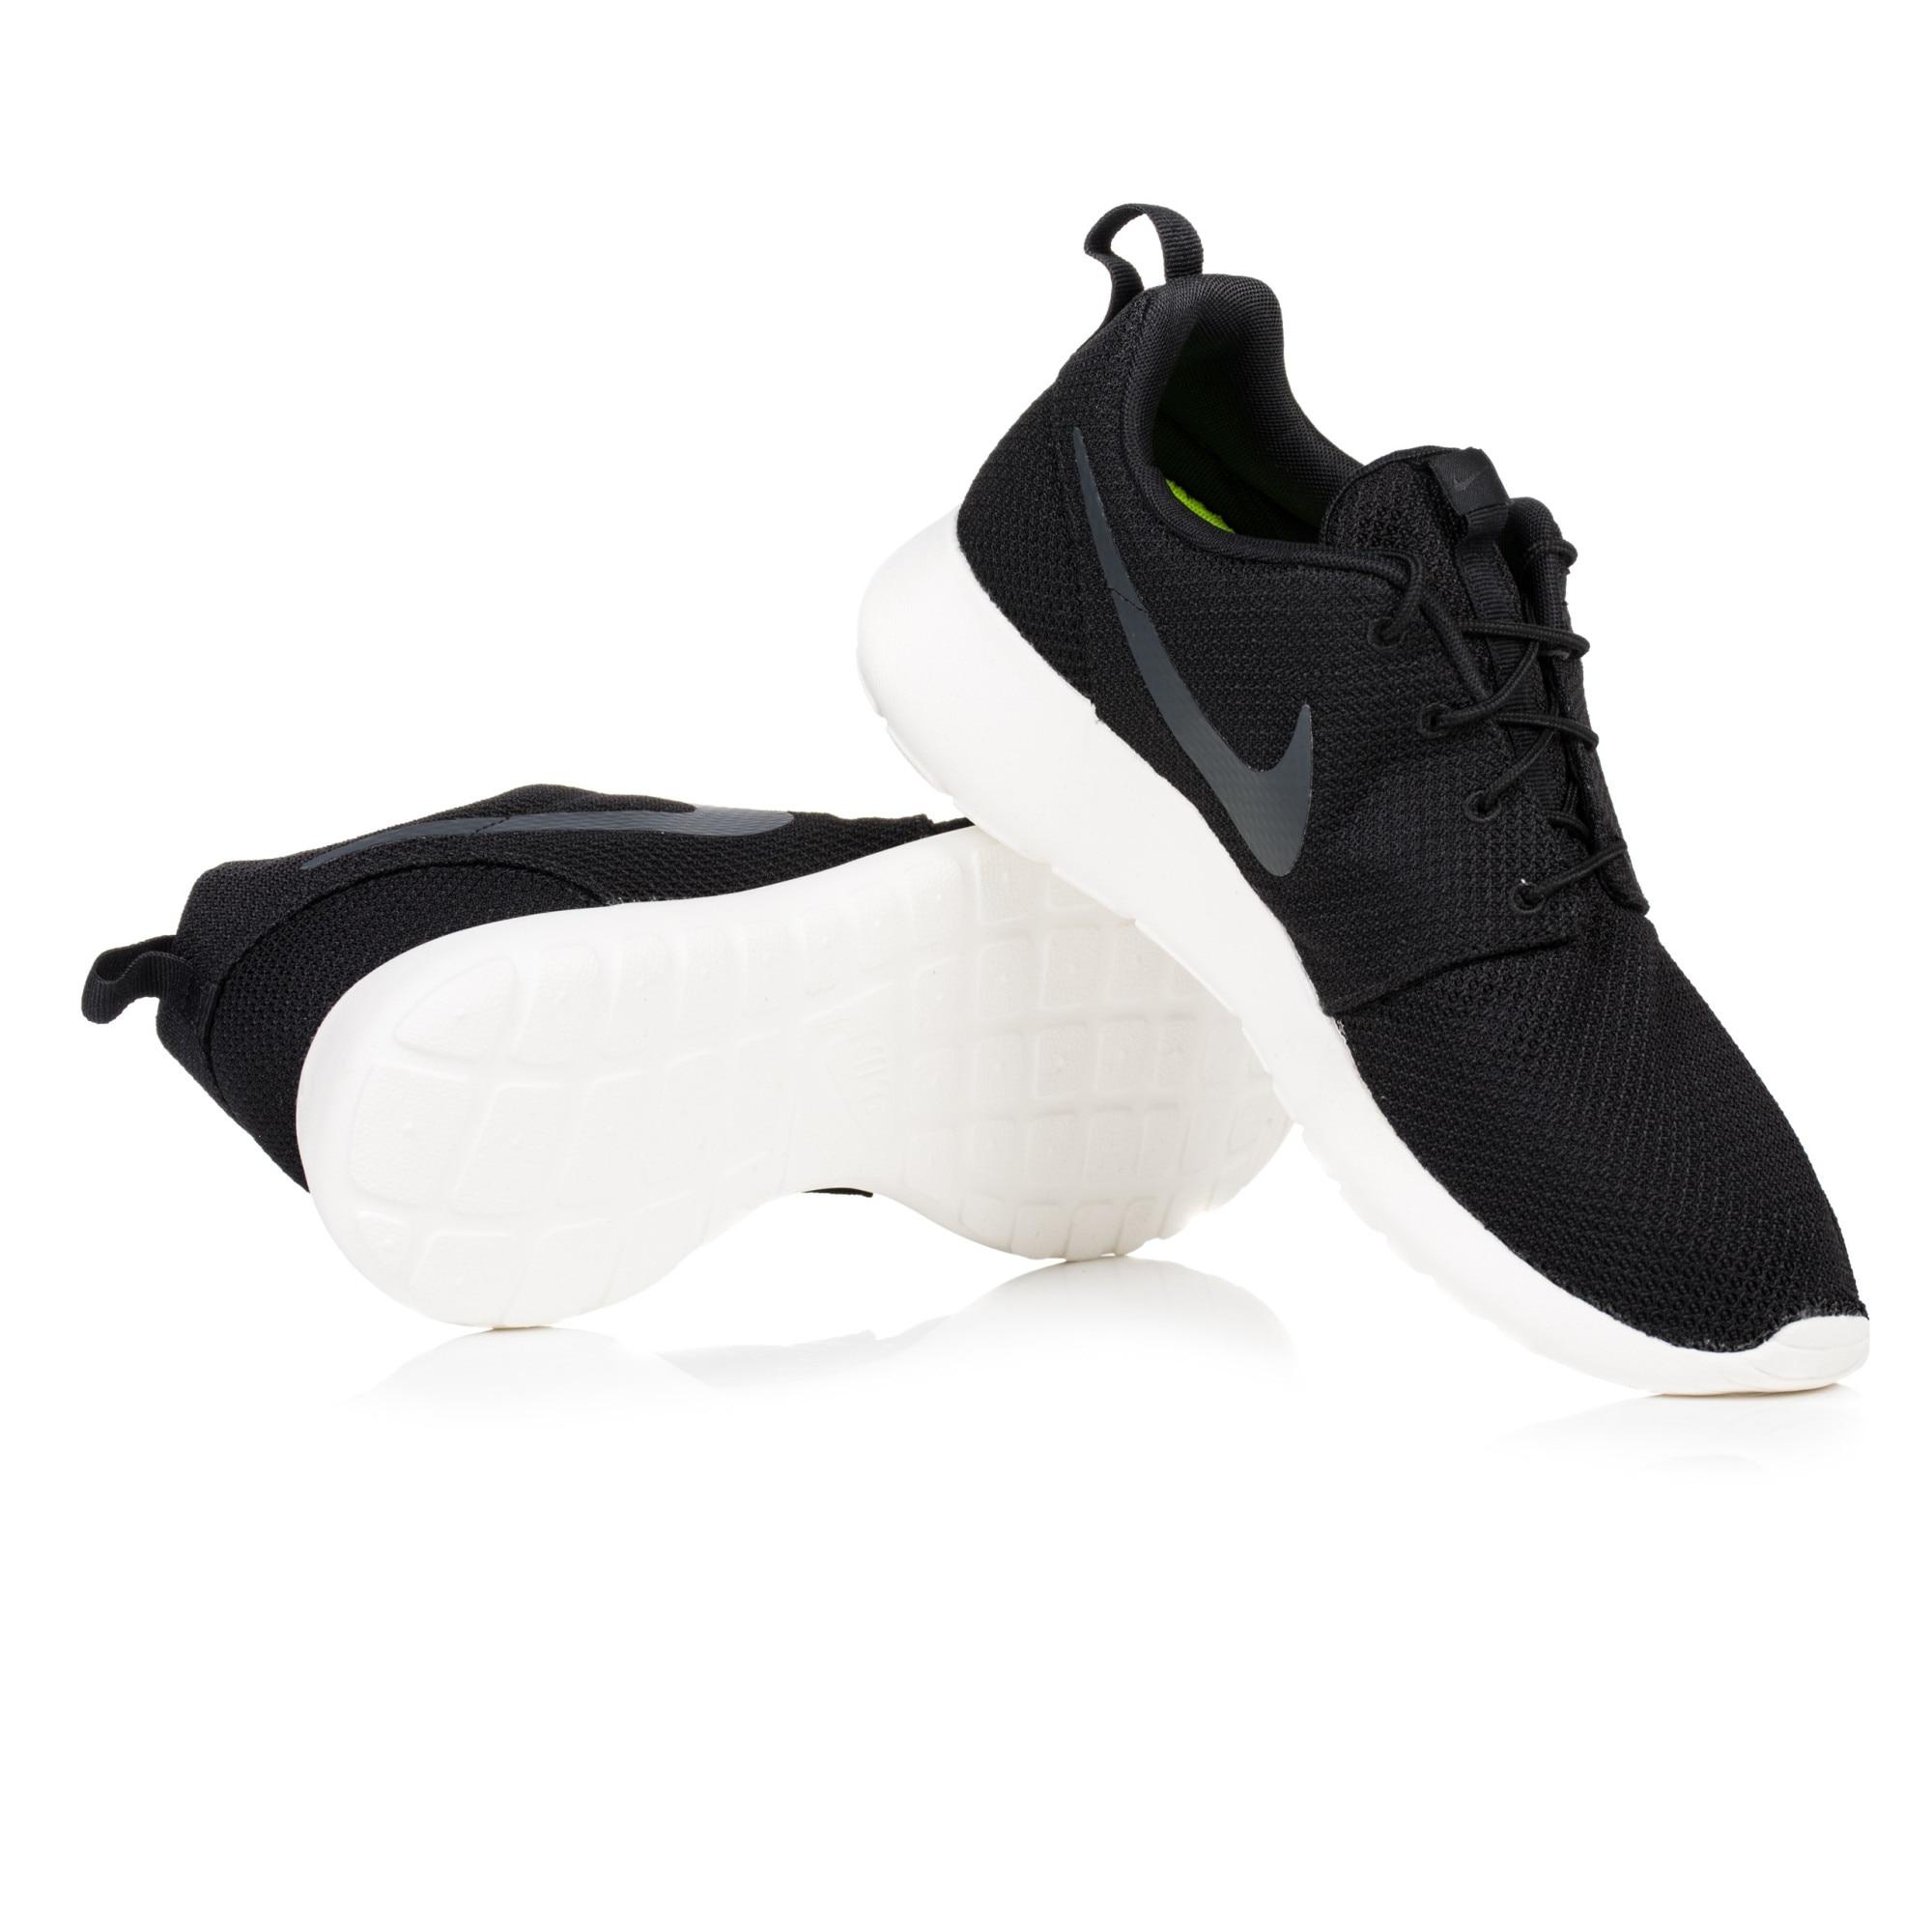 Buty Nike Rosherun 511881 010 45.5